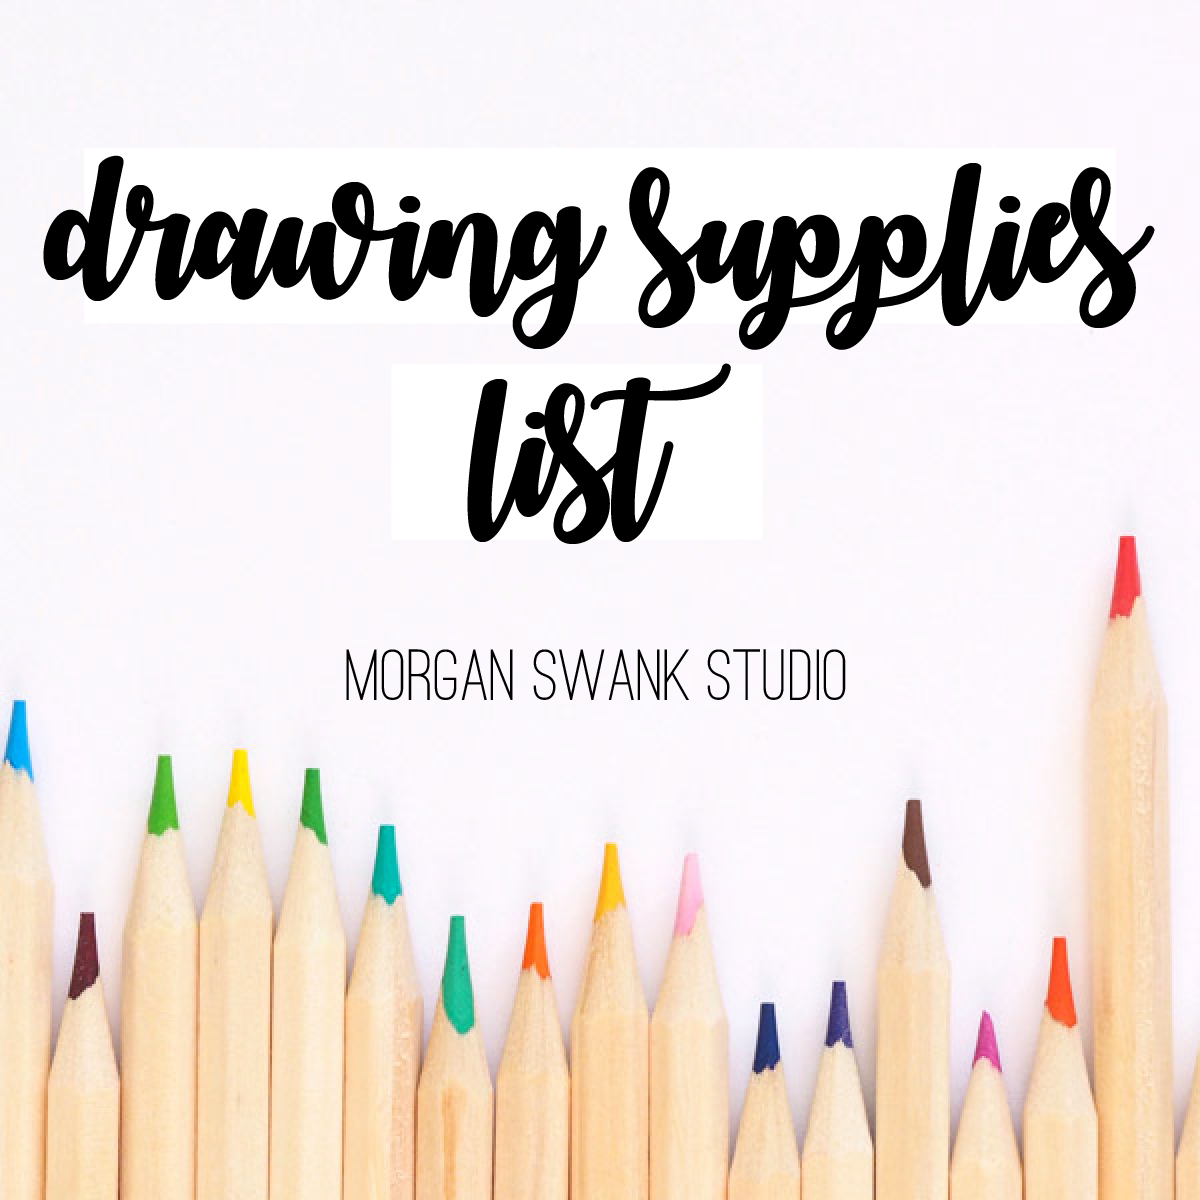 Drawing Supplies List by Morgan Swank Studio